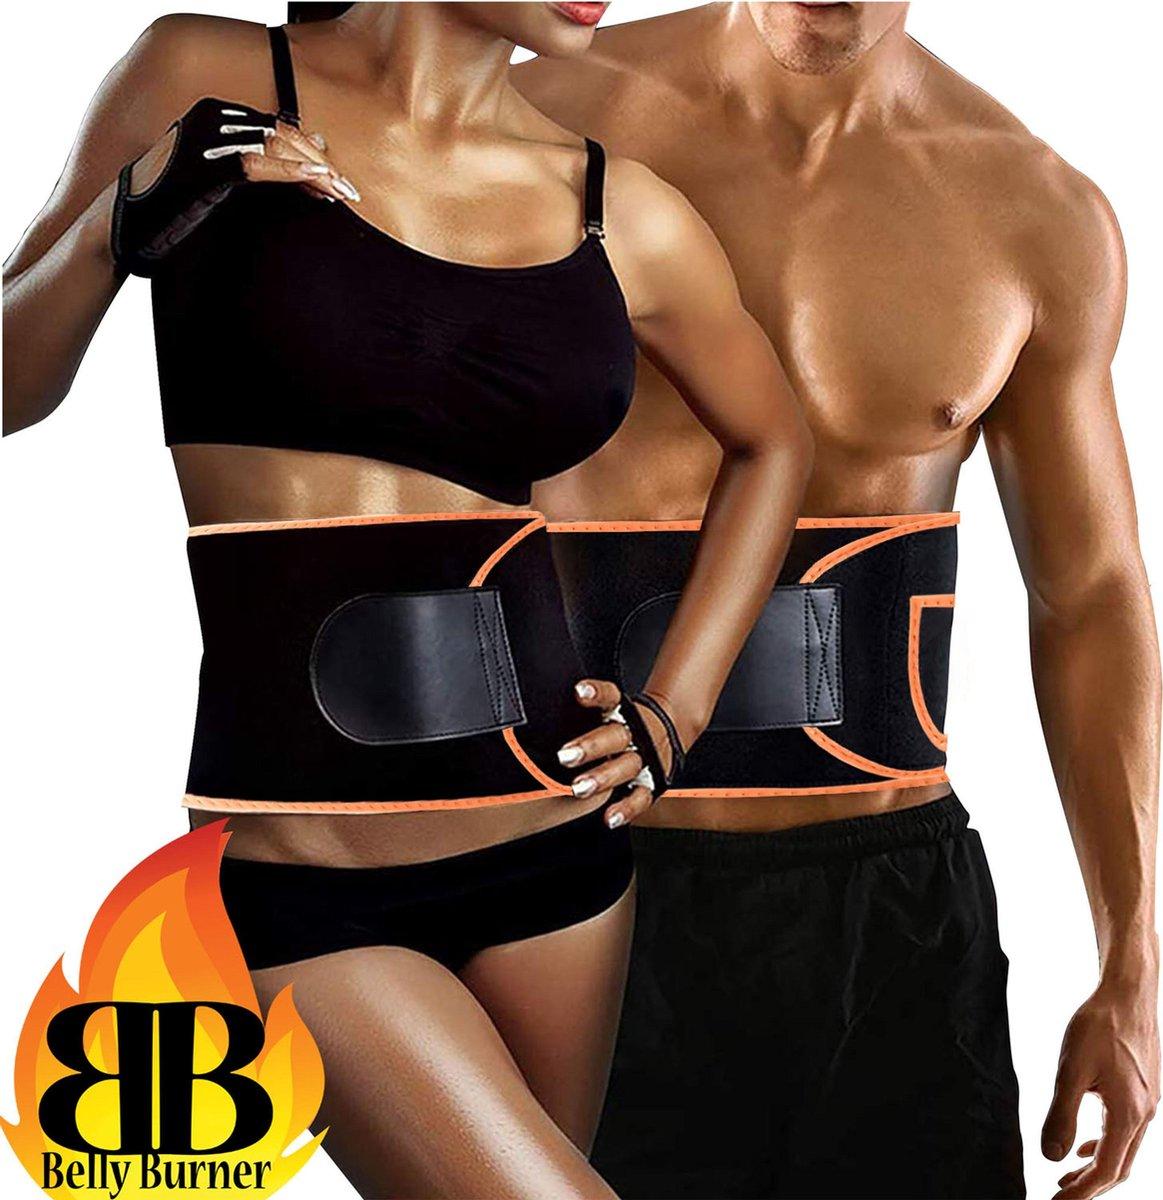 sauna band buik zweetband afslankband afslankgordel sweat belt